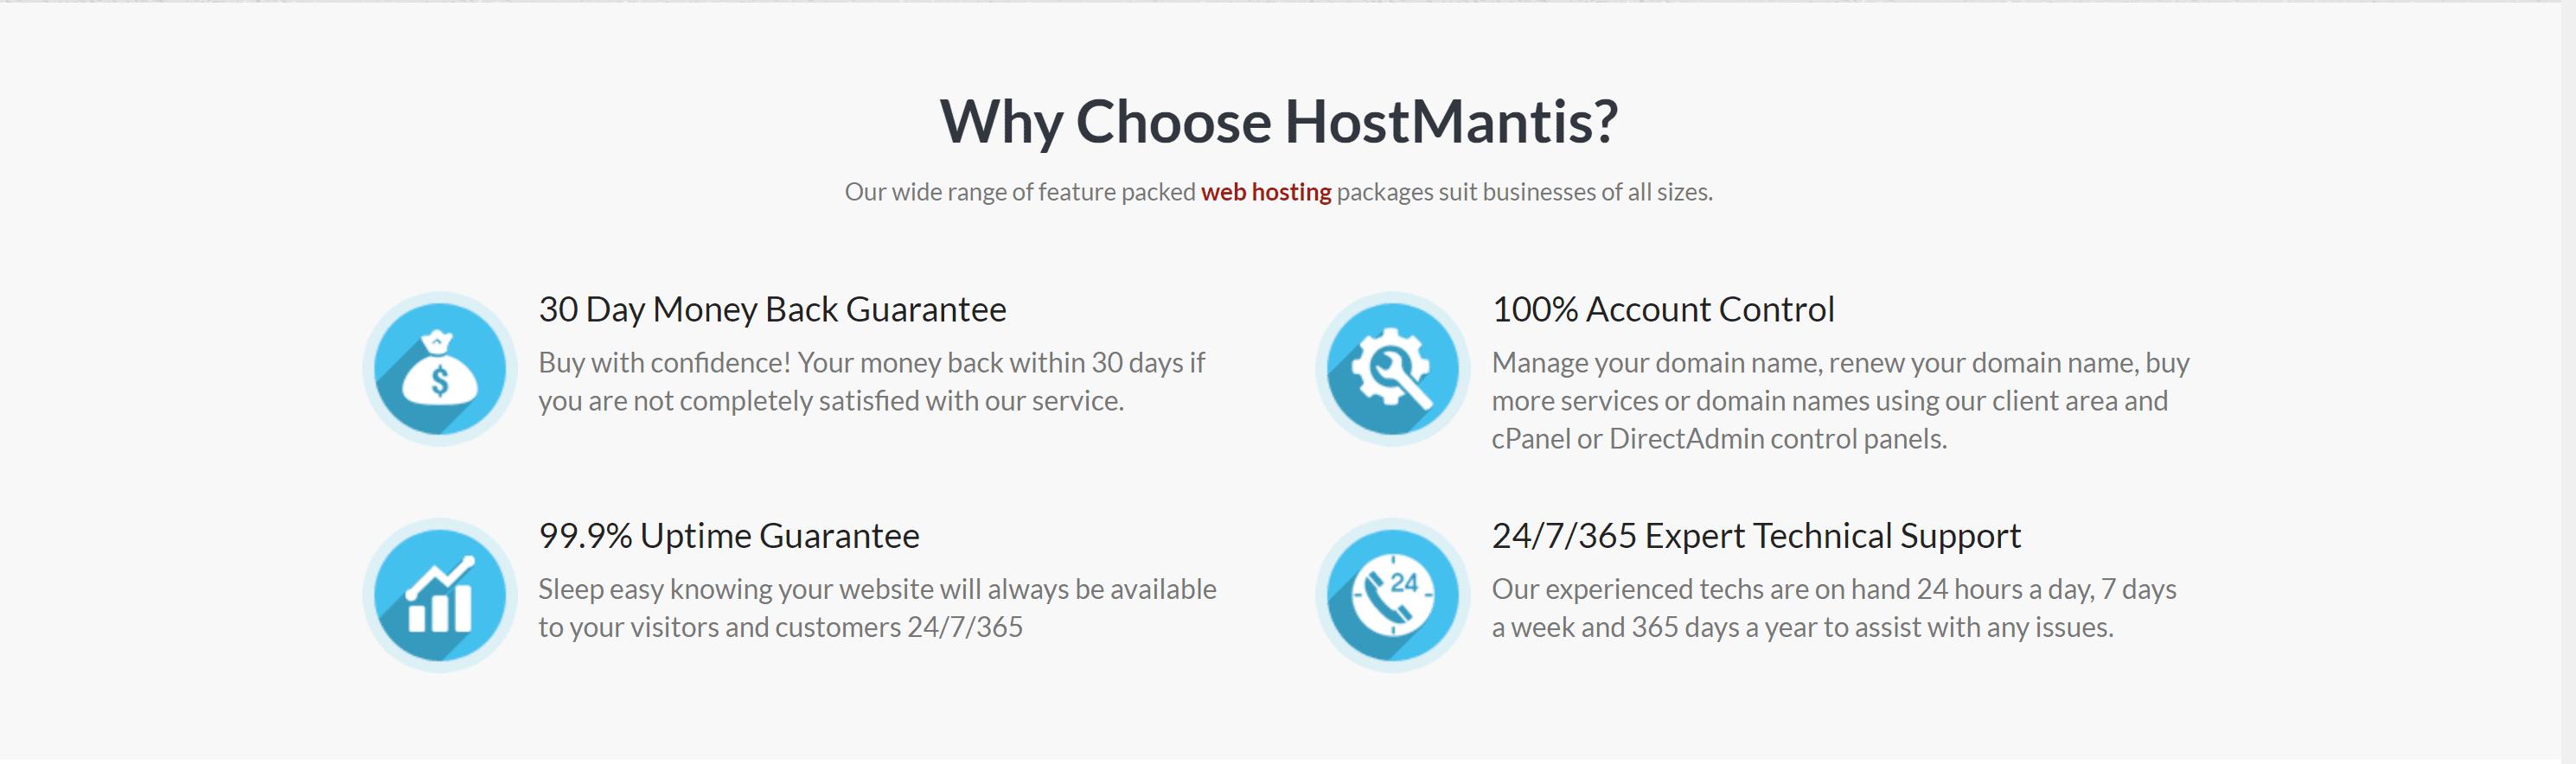 Why choose hostmantis web hosting